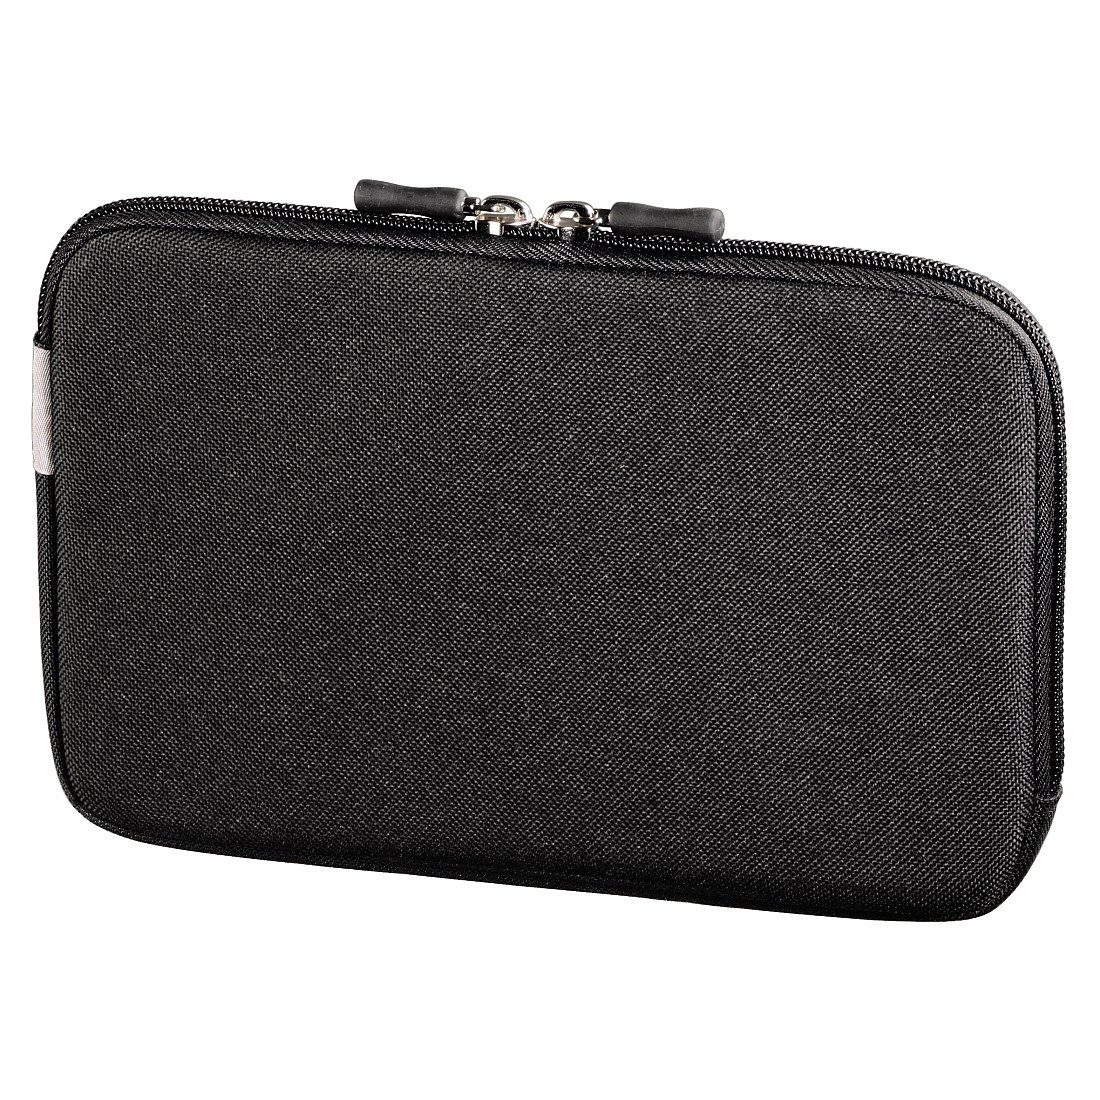 Hama Sleeve Tab für Tablet-PCs, Displaygrößen bis 20,3 cm (8)